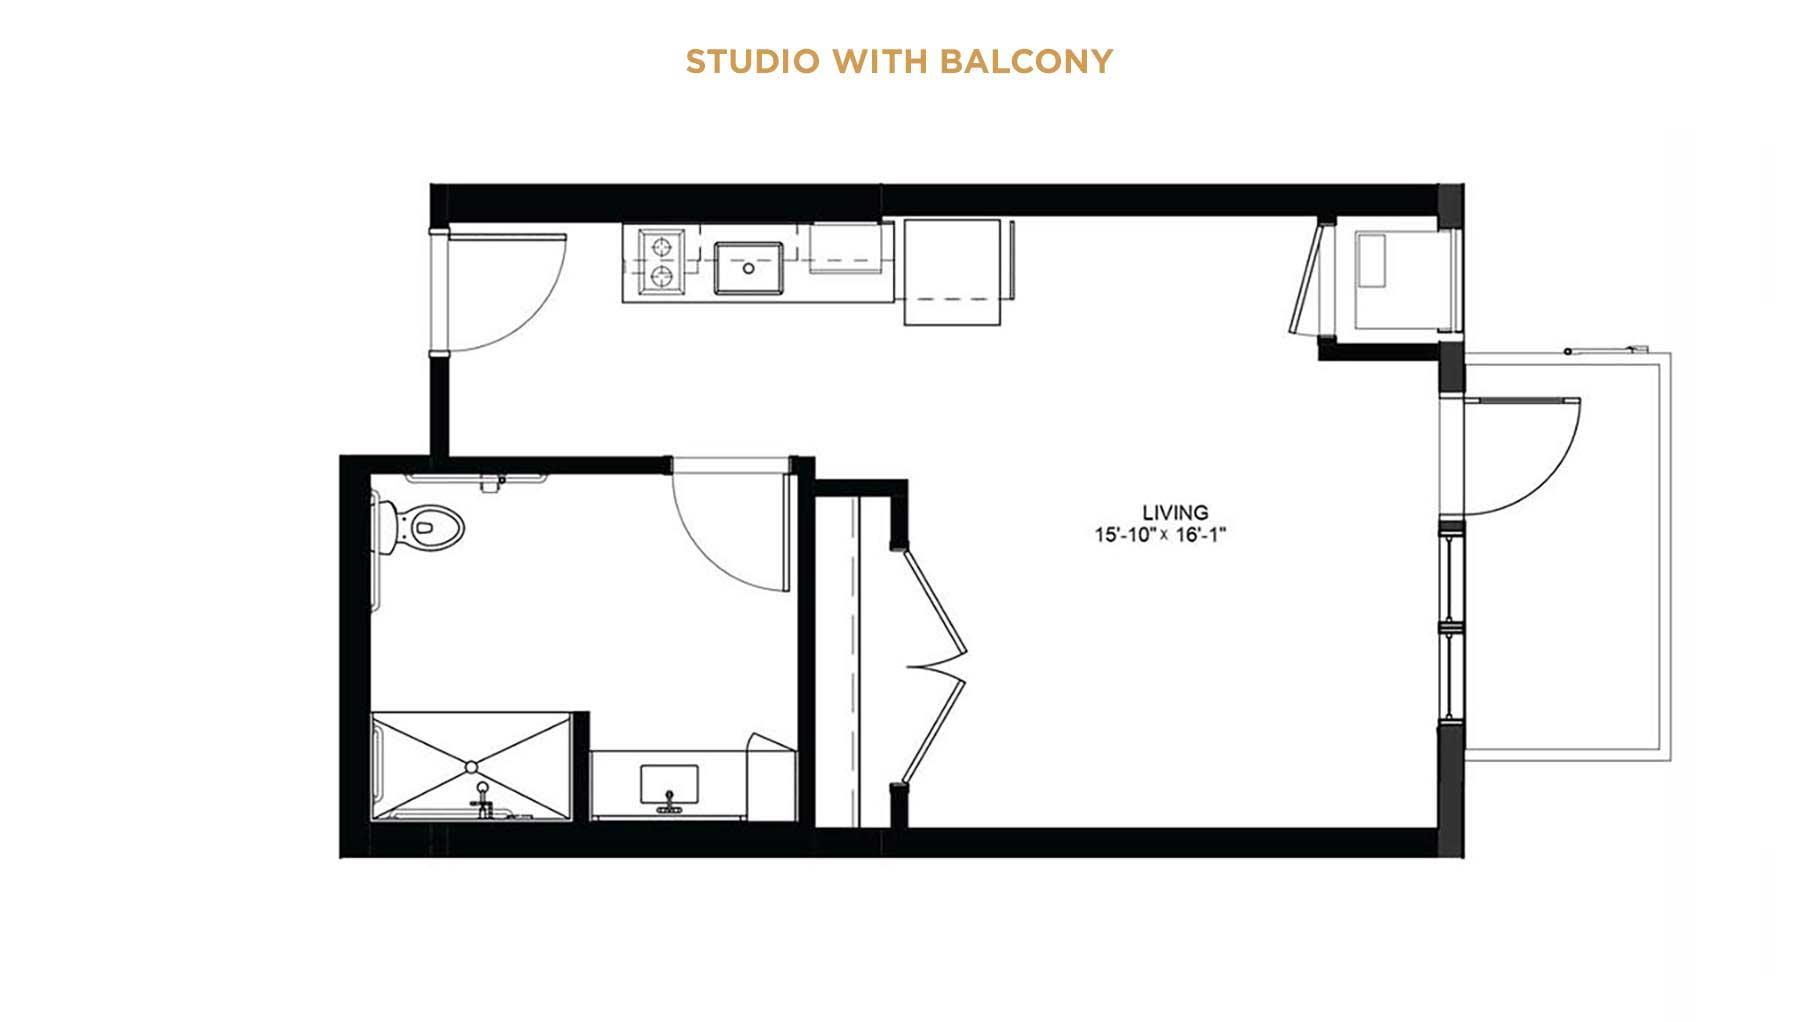 Studio with balcony floorplan